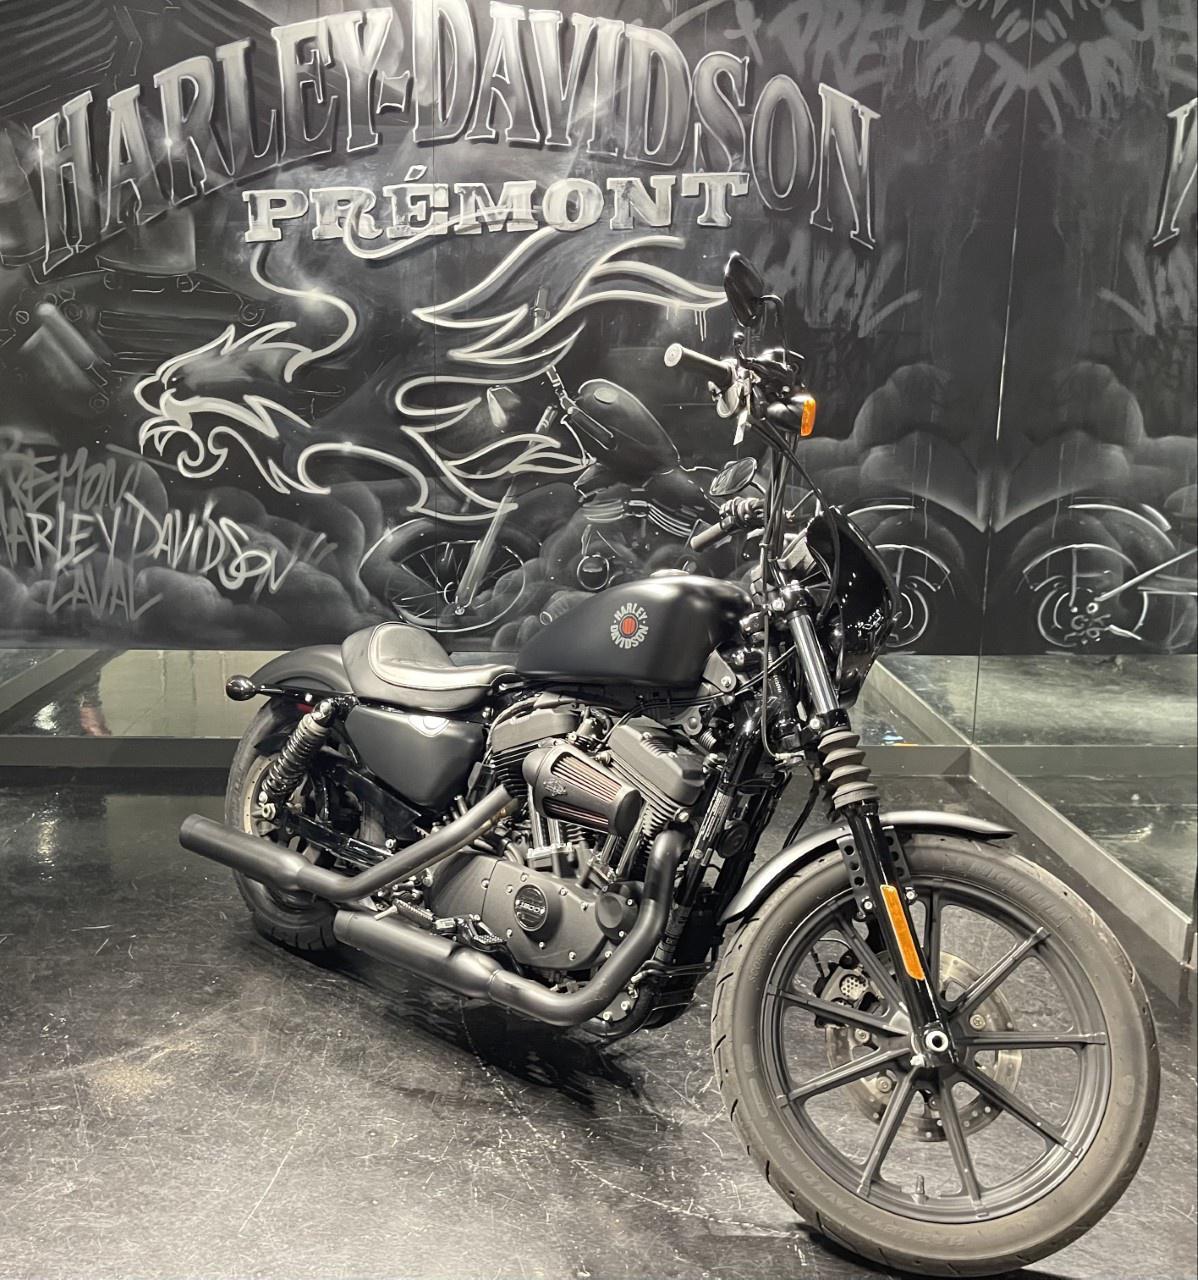 Harley-Davidson XL1200NS 2019 - Iron 1200